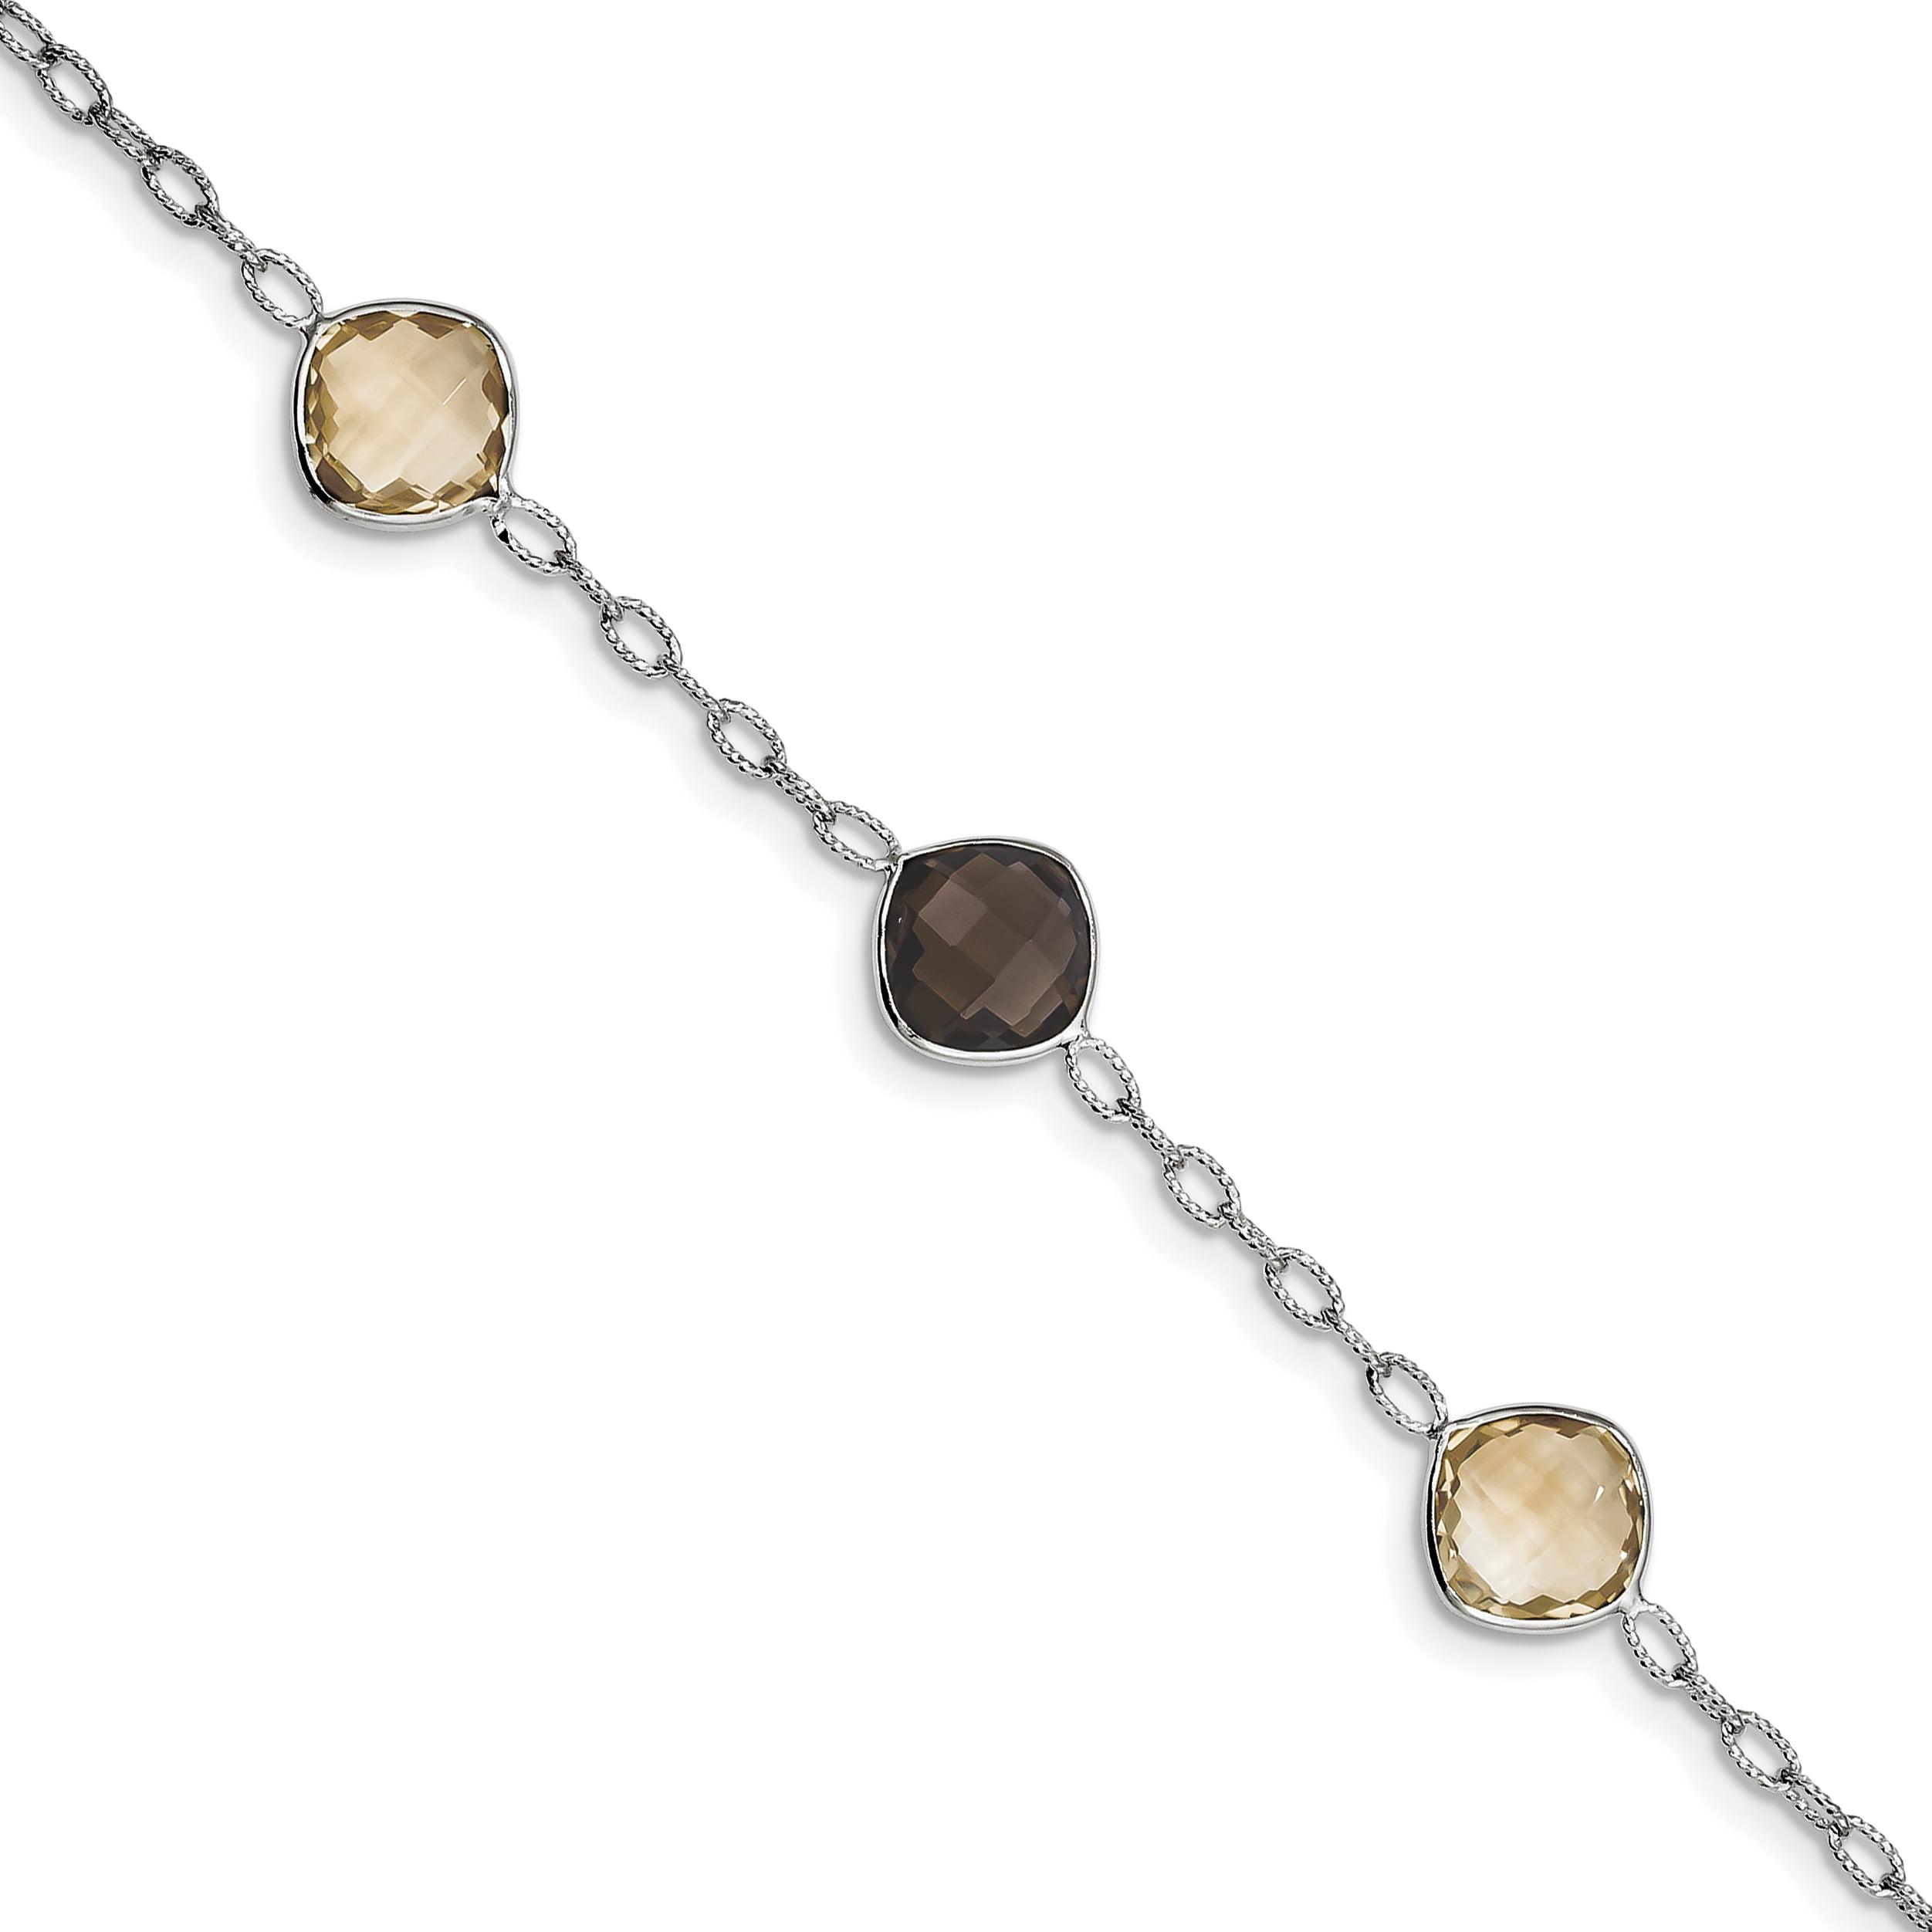 Sterling Silver Rhodium-plated Citrine & Smoky Quartz Bracelet QX867CI by Core Silver